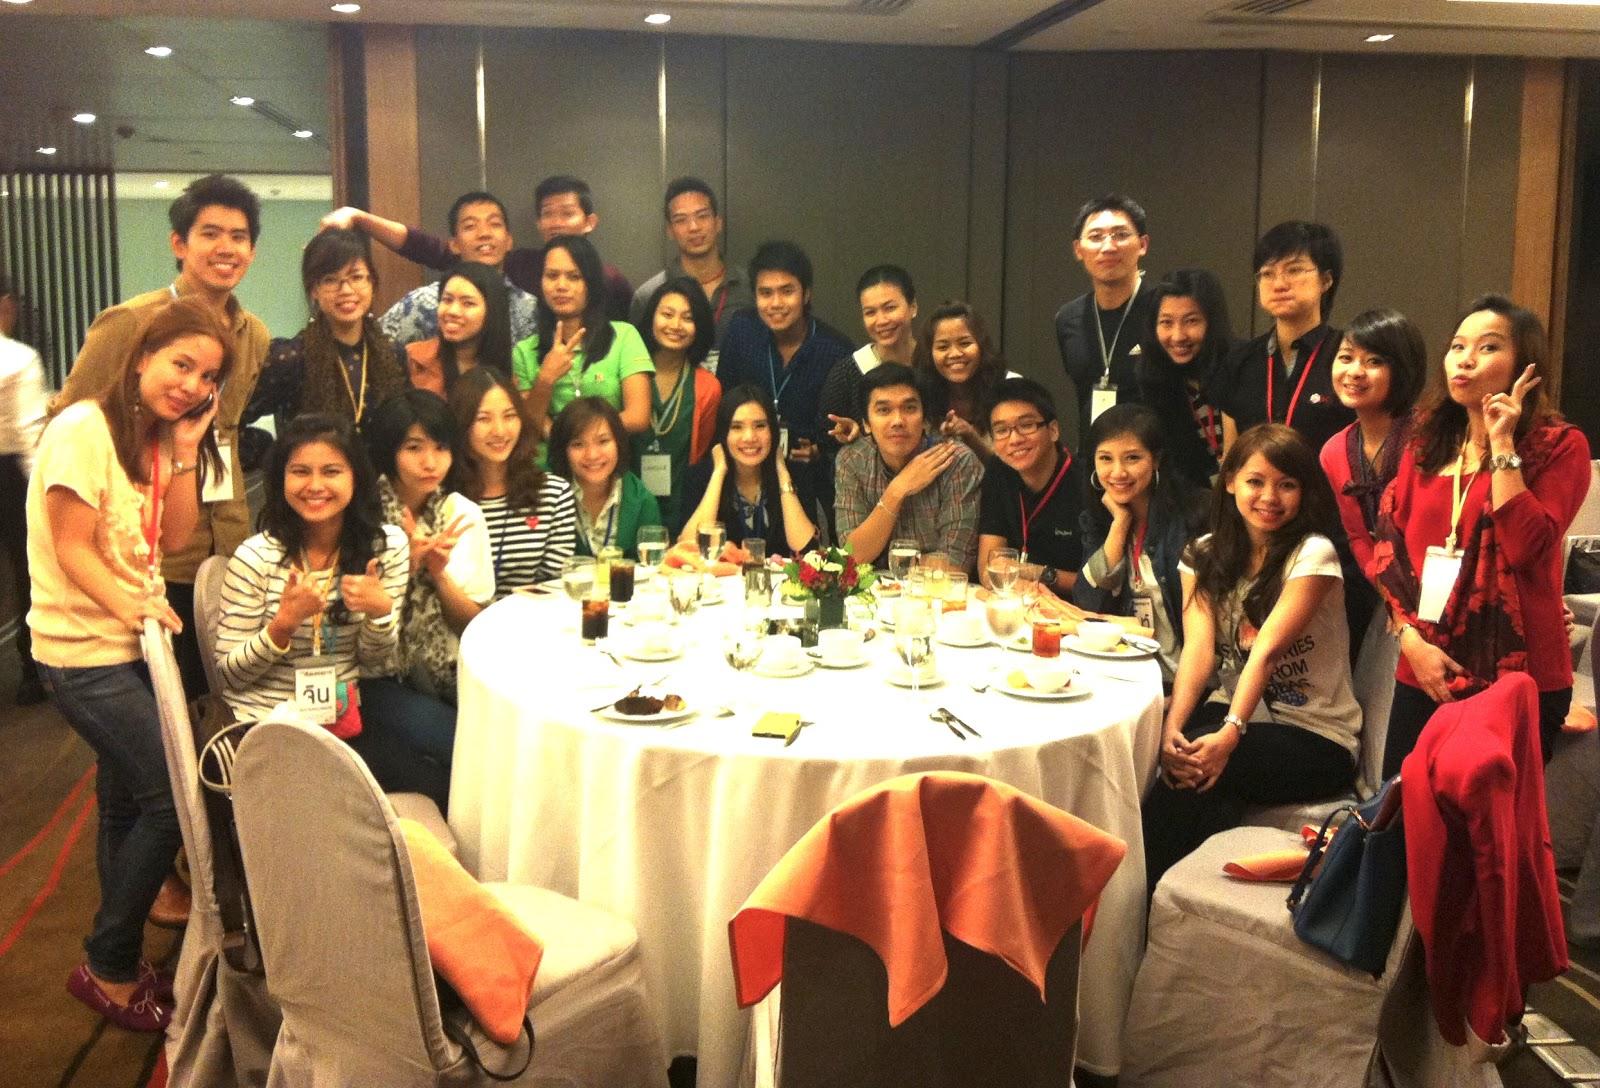 Ambassador Hotel Bangkok 48 (60) 18